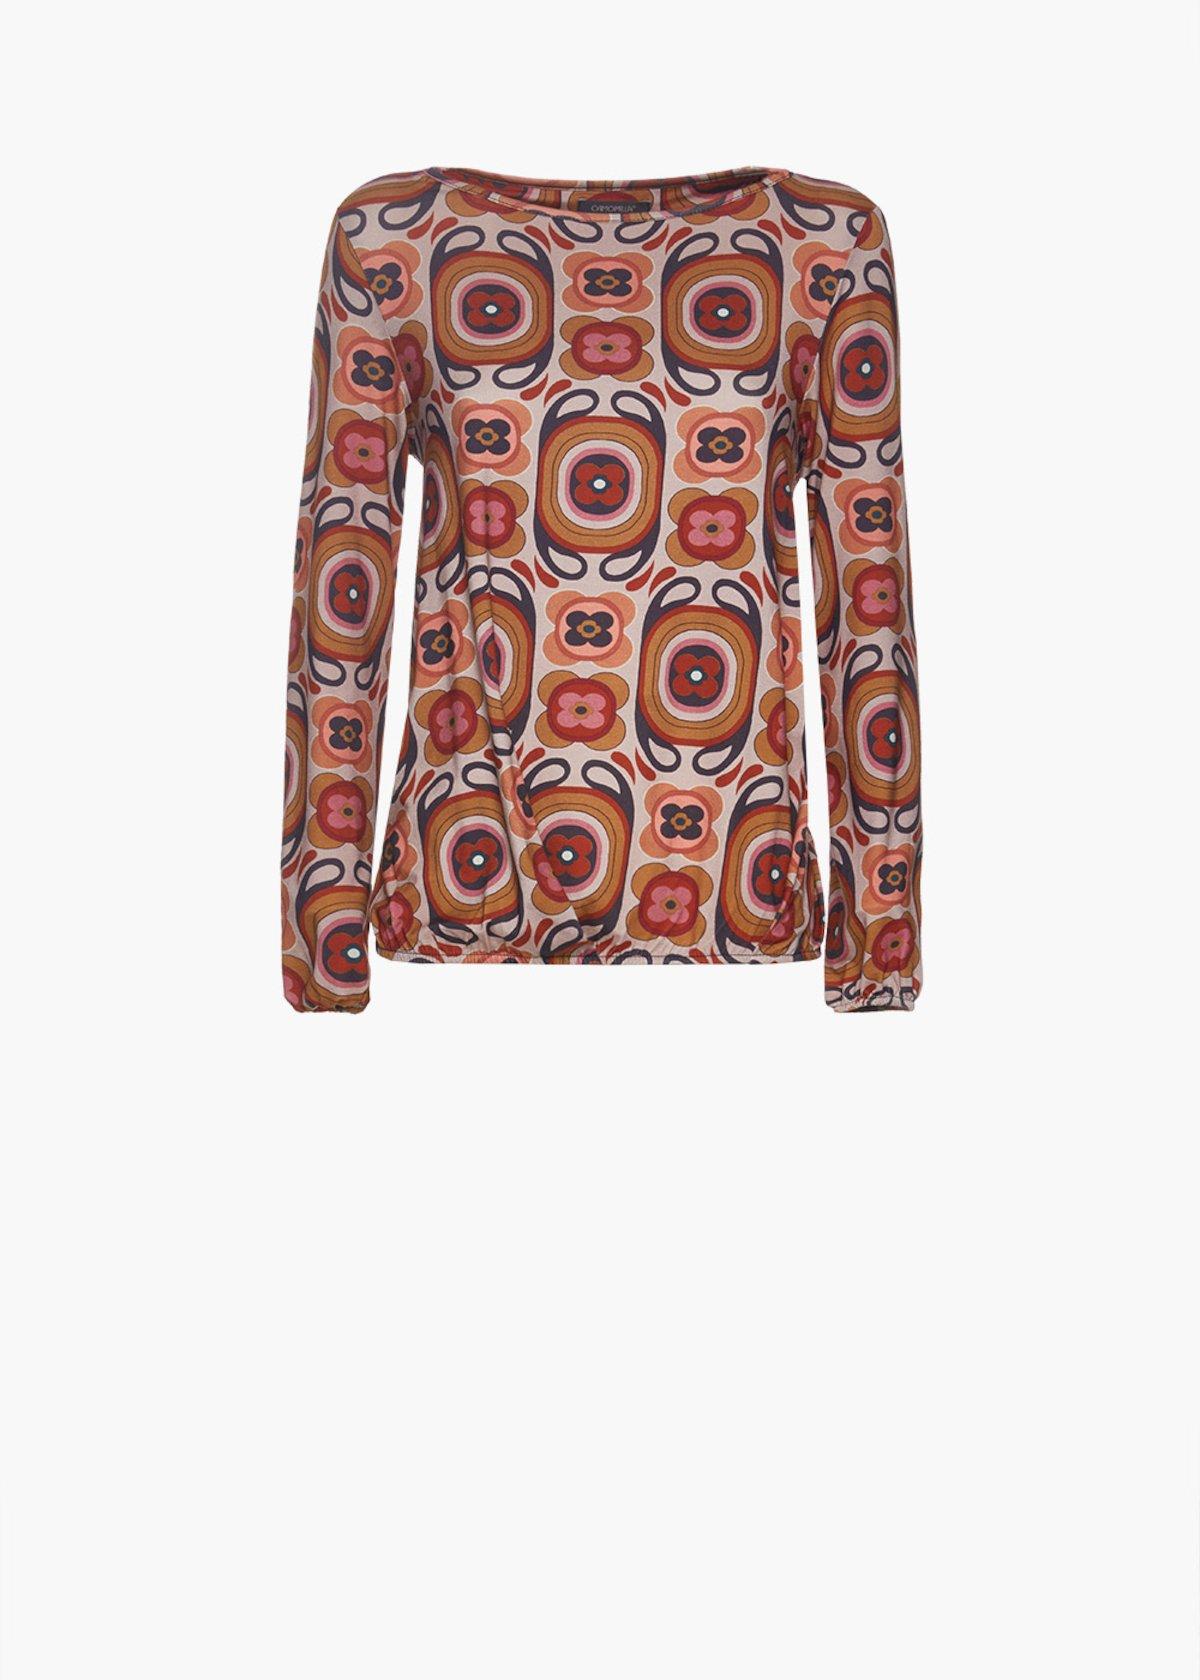 Egg model patterned hippie blouse Soleil